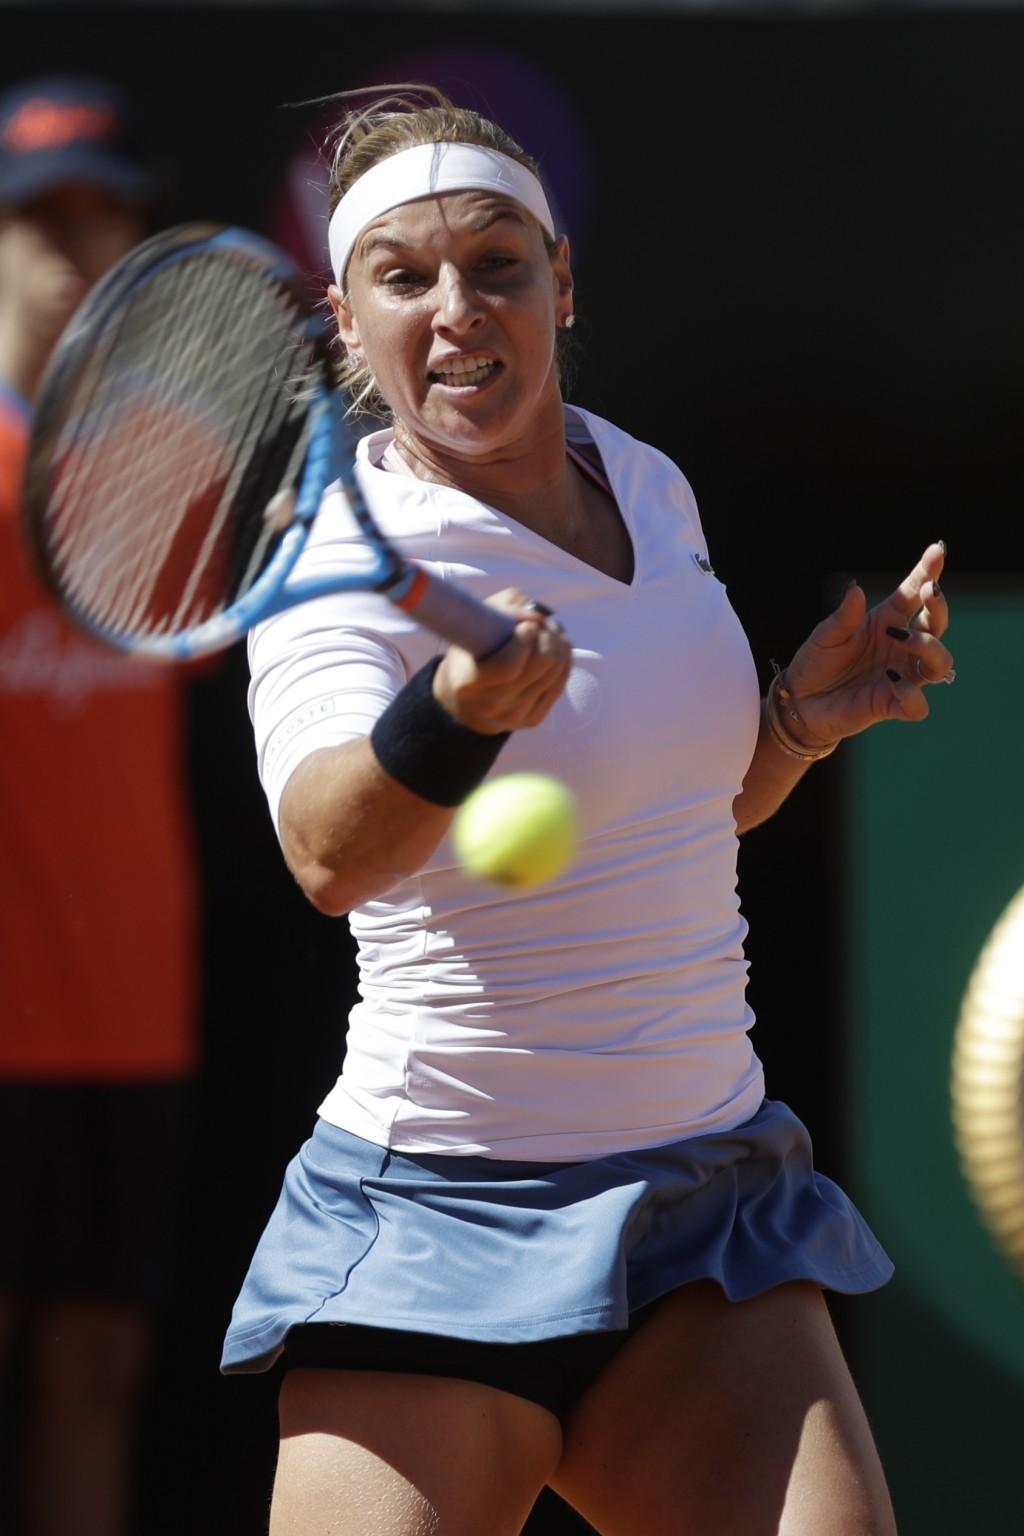 Slovakia's Dominika Cibulkova returns the ball during her match against Japan's Naomi Osaka at the Italian Open tennis tournament, in Rome, Thursday,